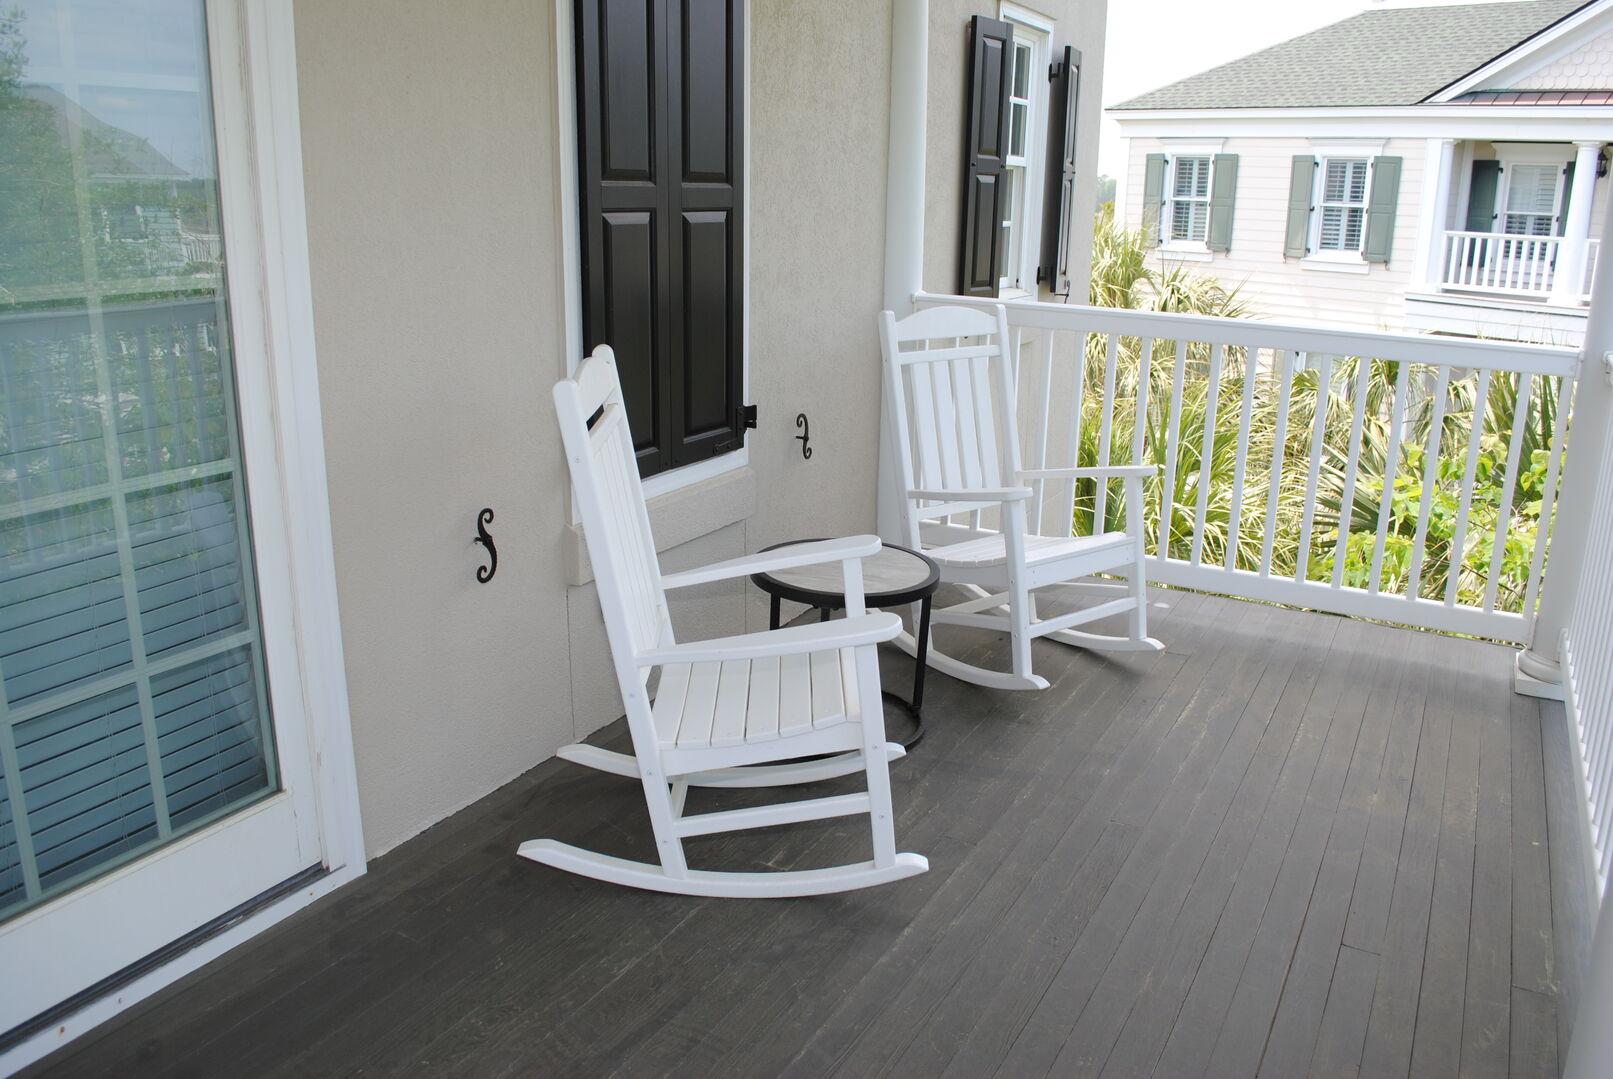 King Porch - Second Floor